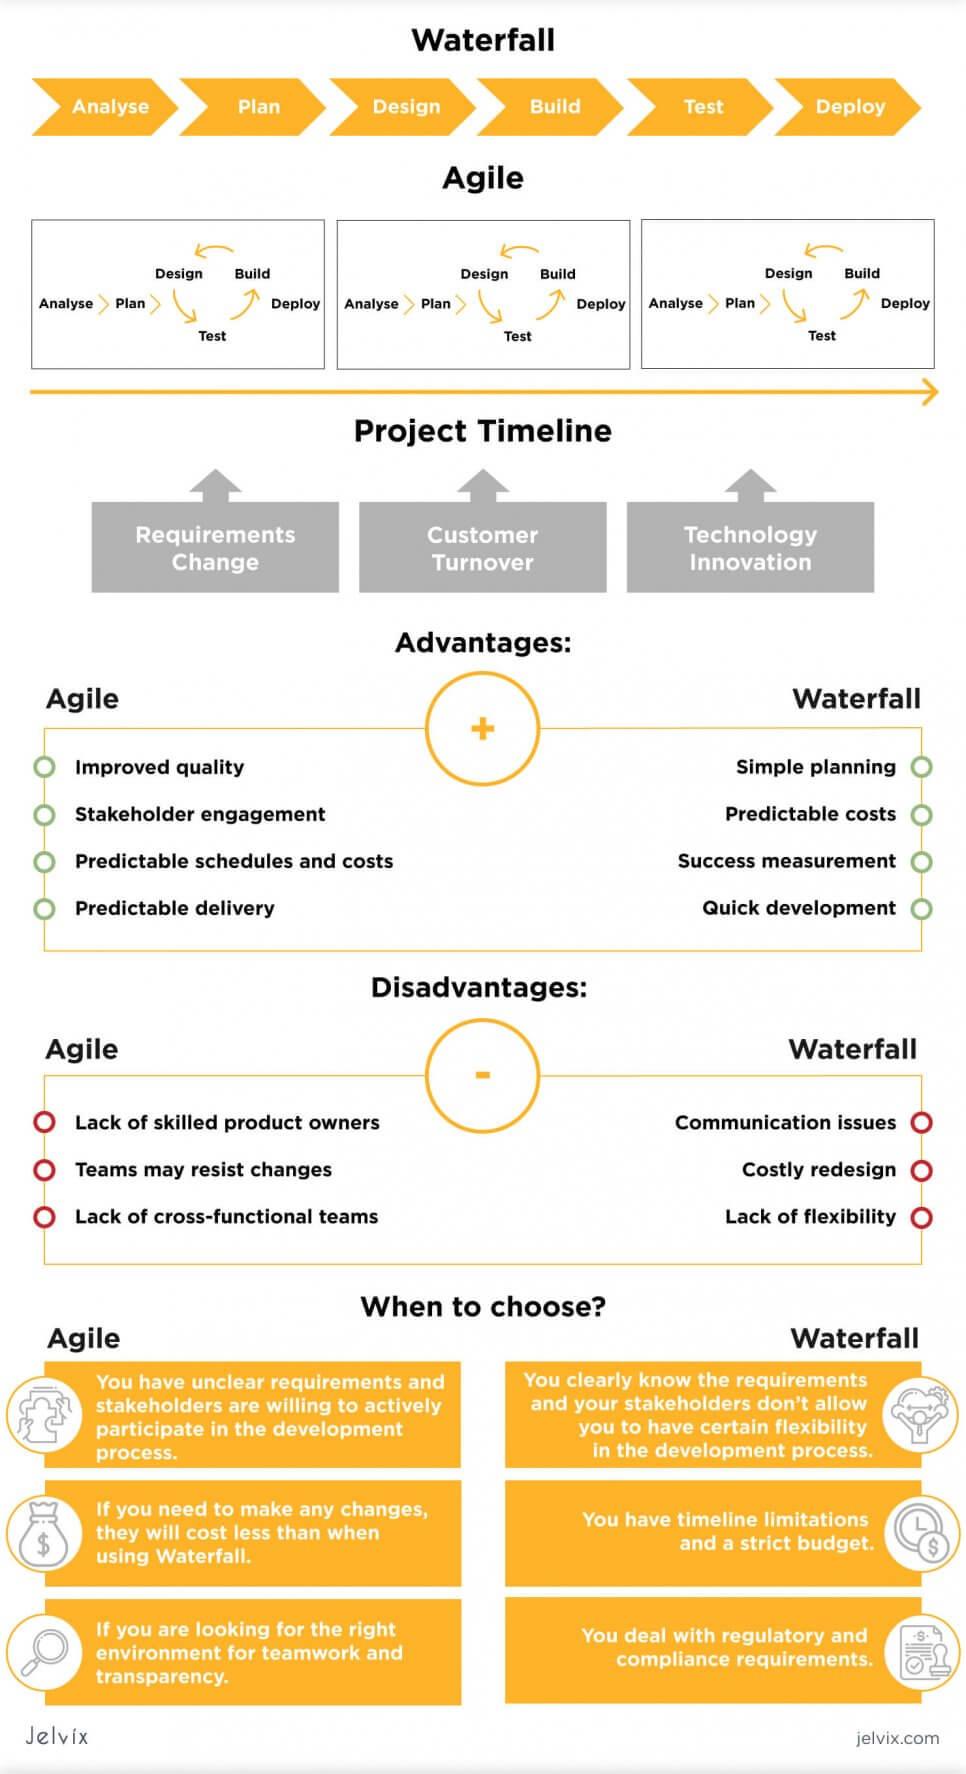 waterfall vs agile infographic